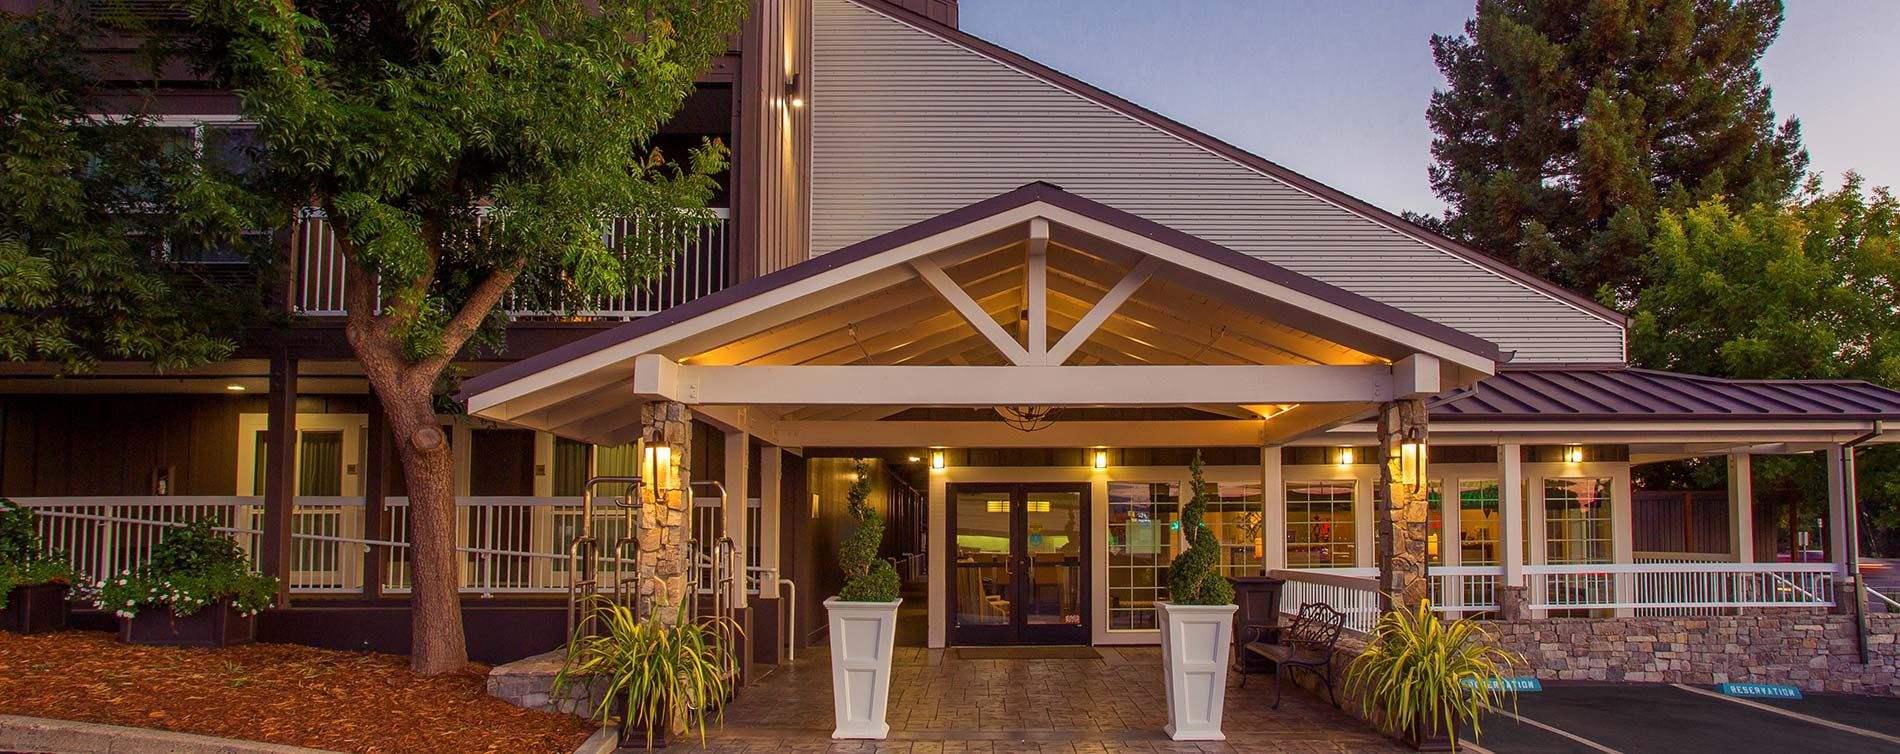 Best Western Plus Inn At The Vines Napa California Main Image